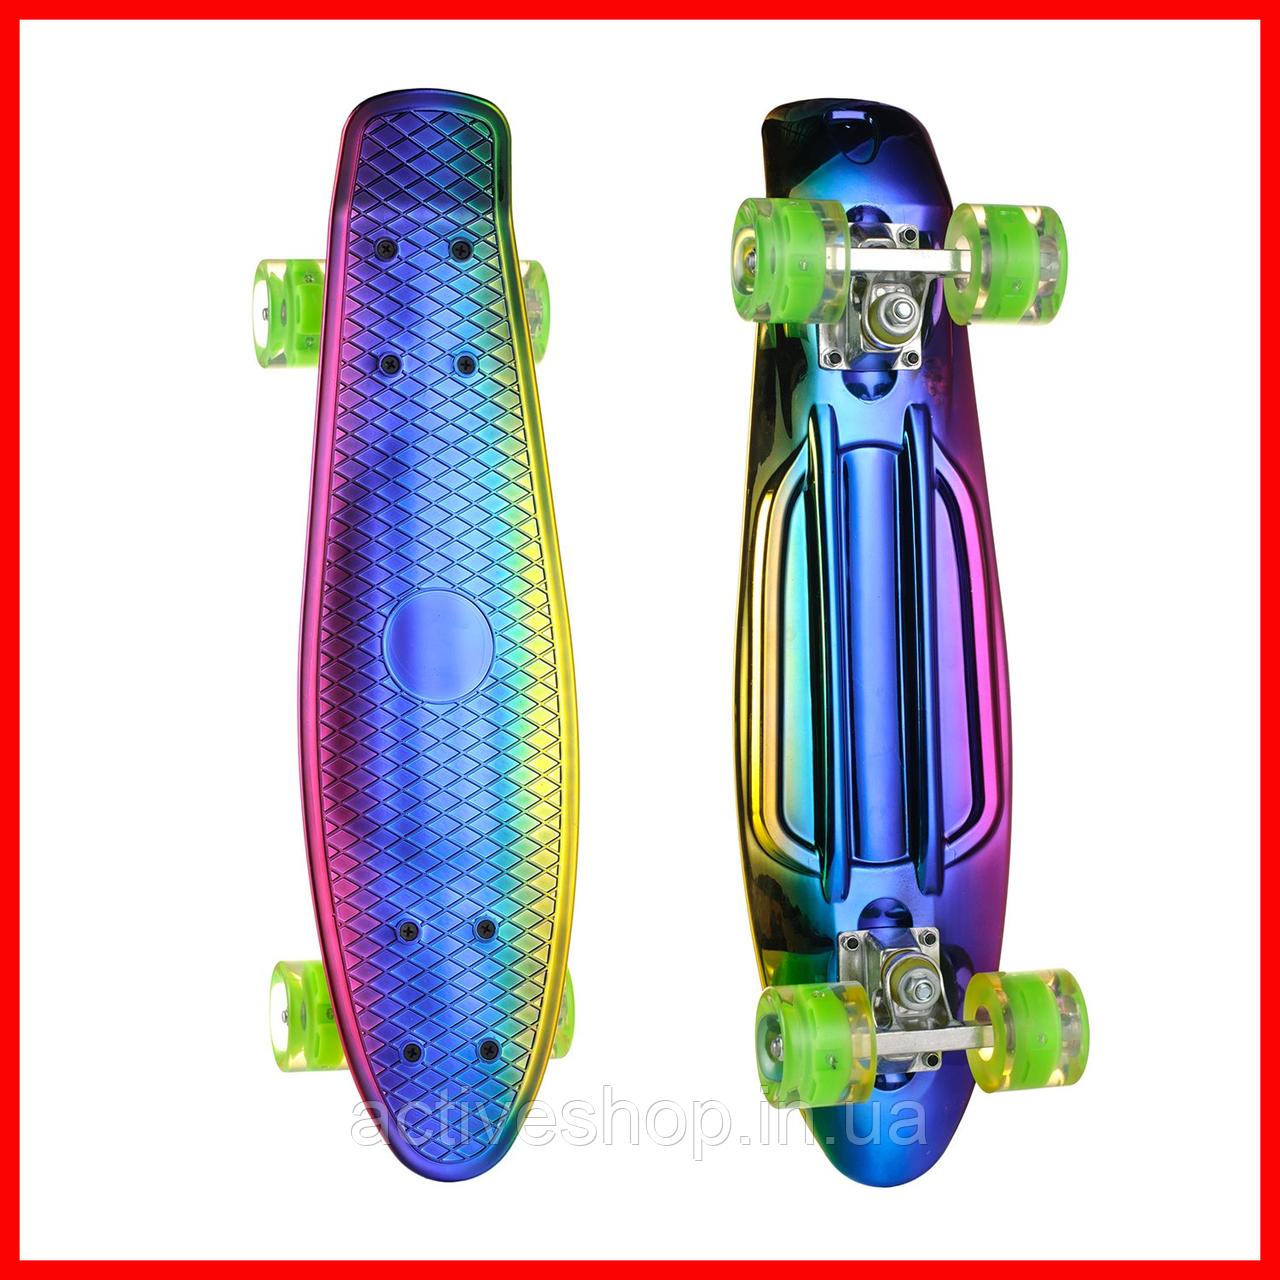 Пенниборд, скейт, пениборд детский 126 Хамелеон Penny